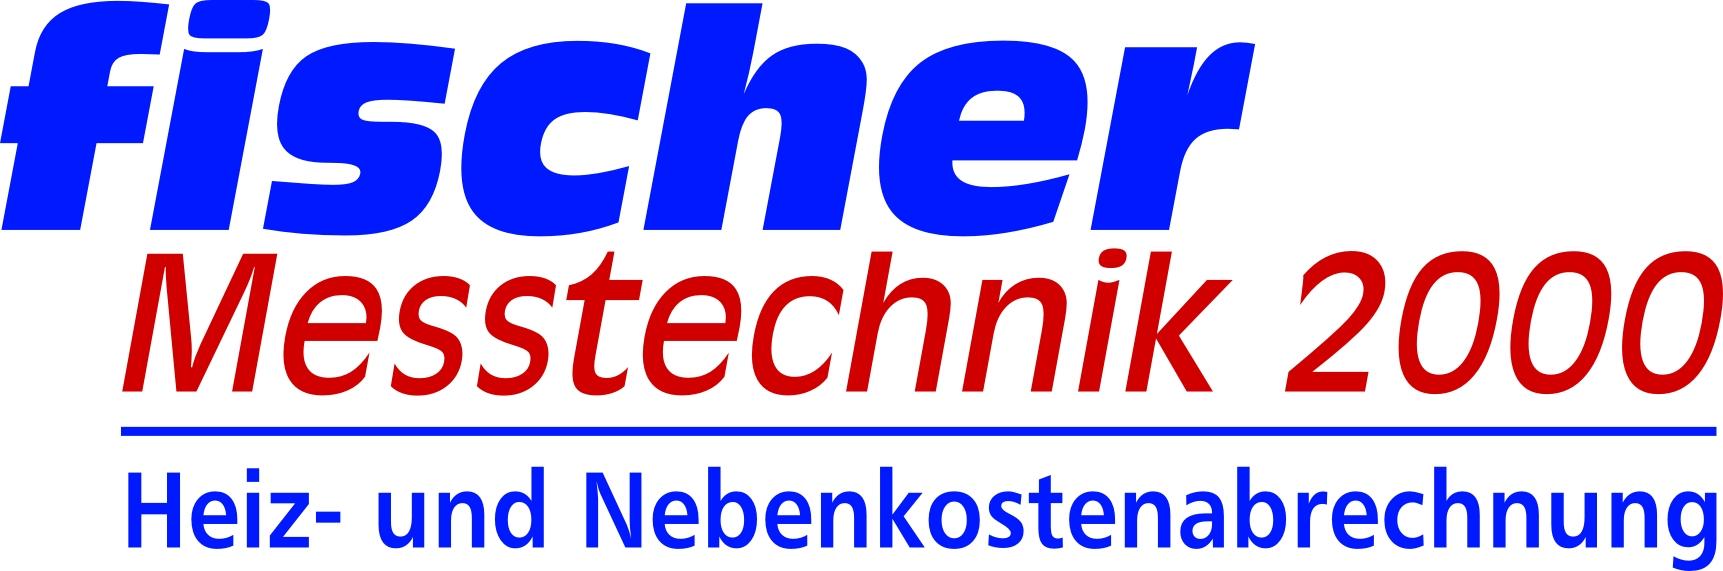 Fischer Messtechnik 2000